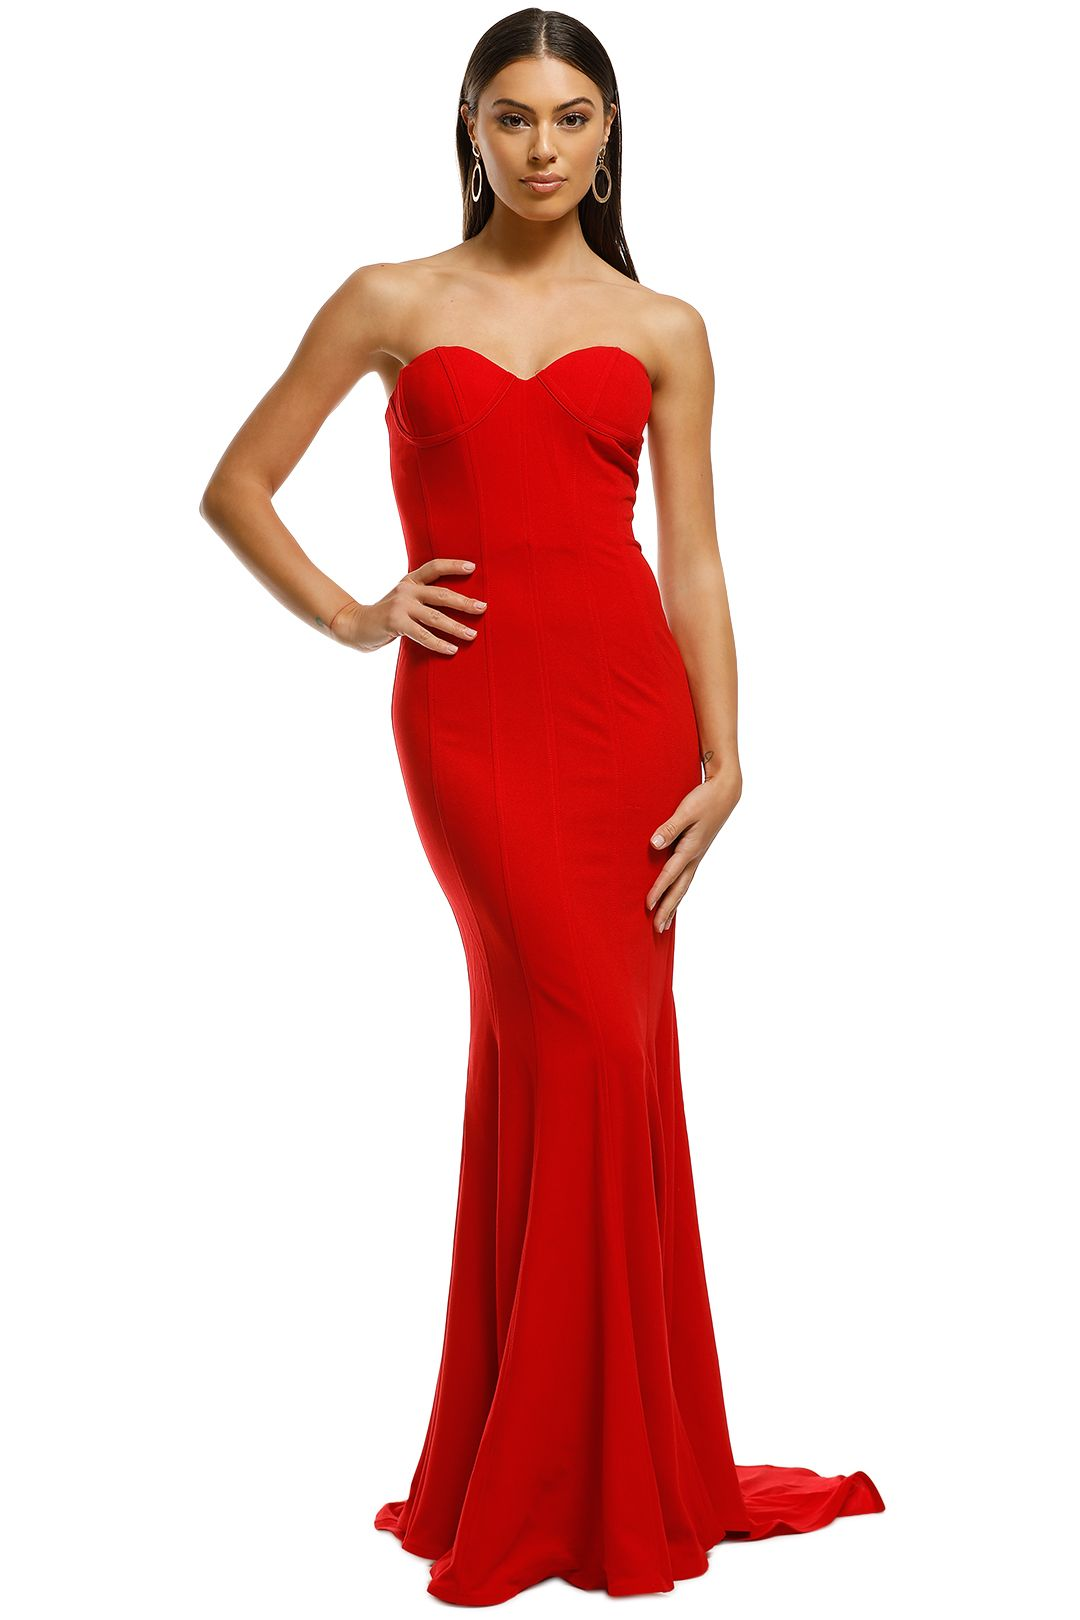 Lexi - Sahar Dress - Red - Front